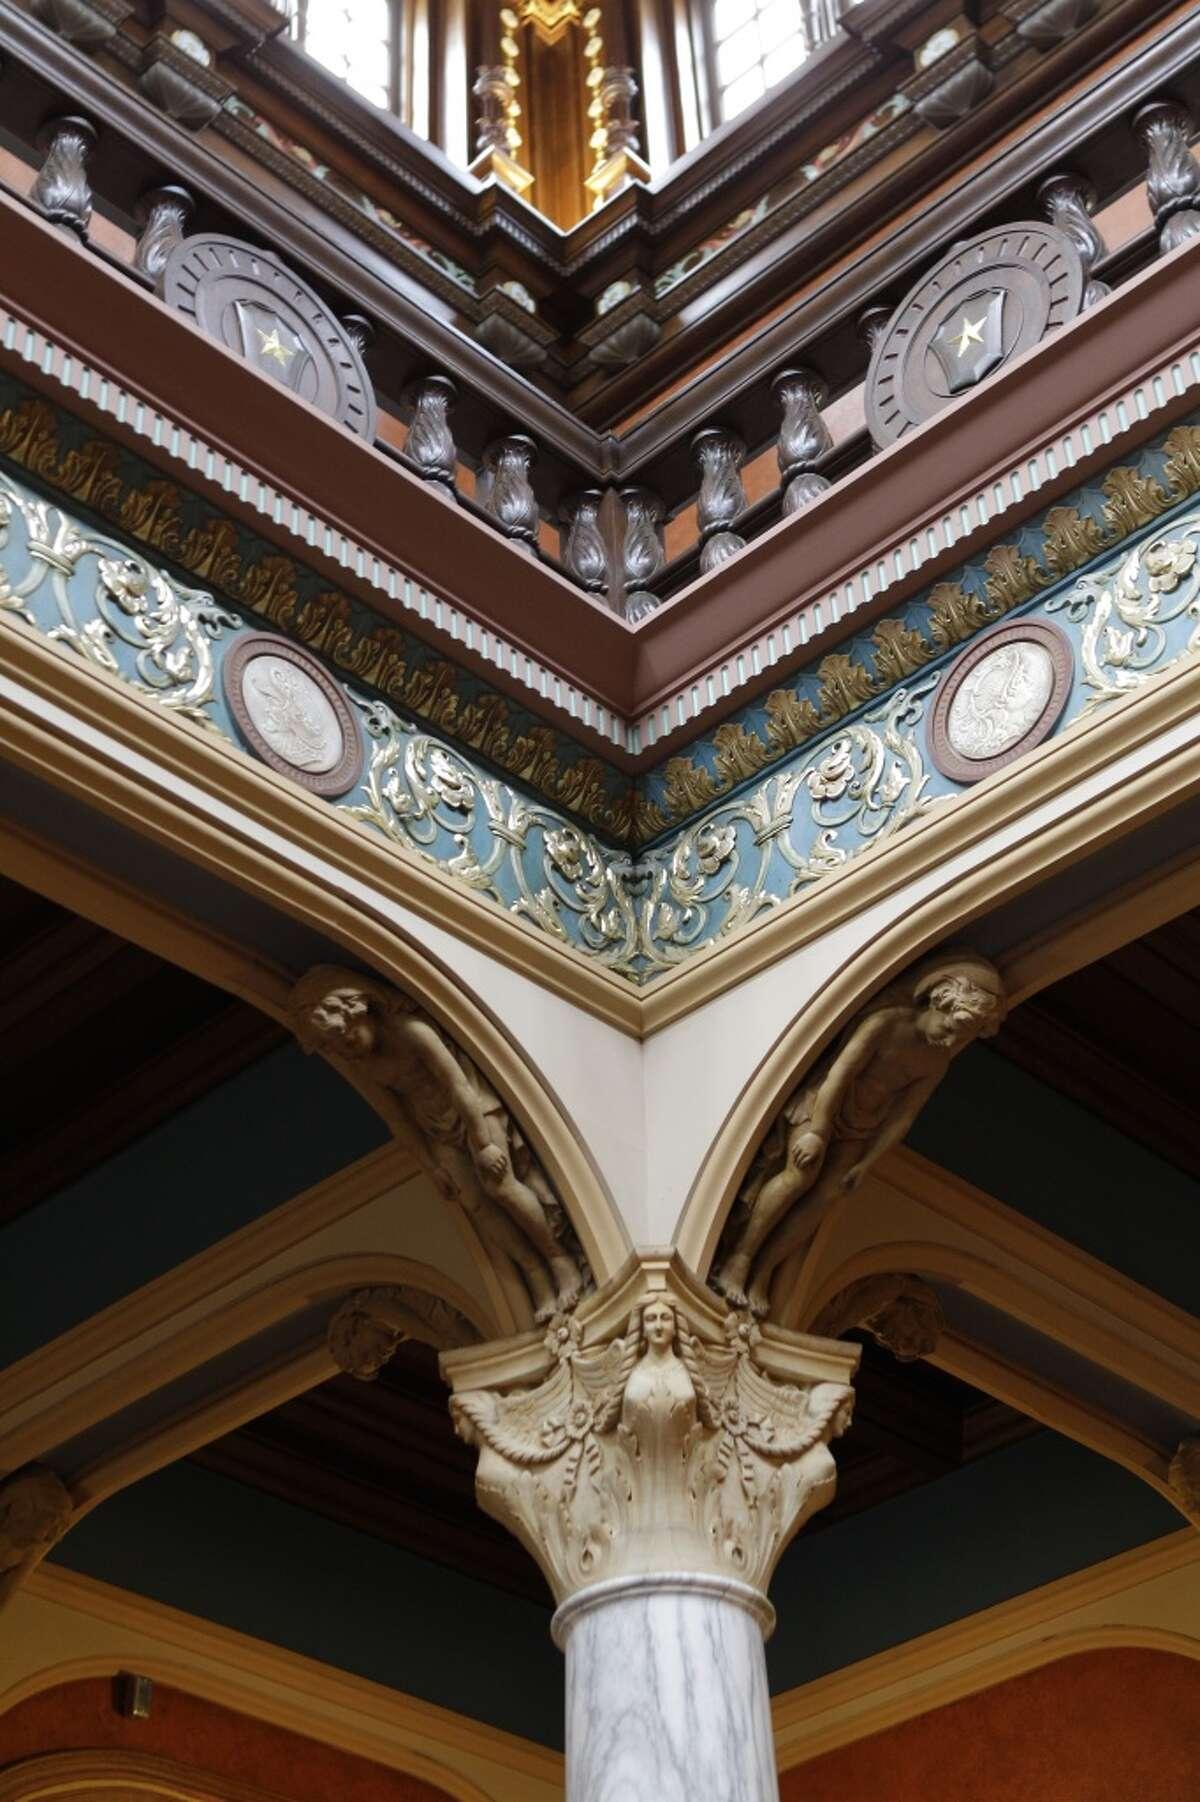 Julia Ideson Library 550 McKinney, Houston832-393-1662